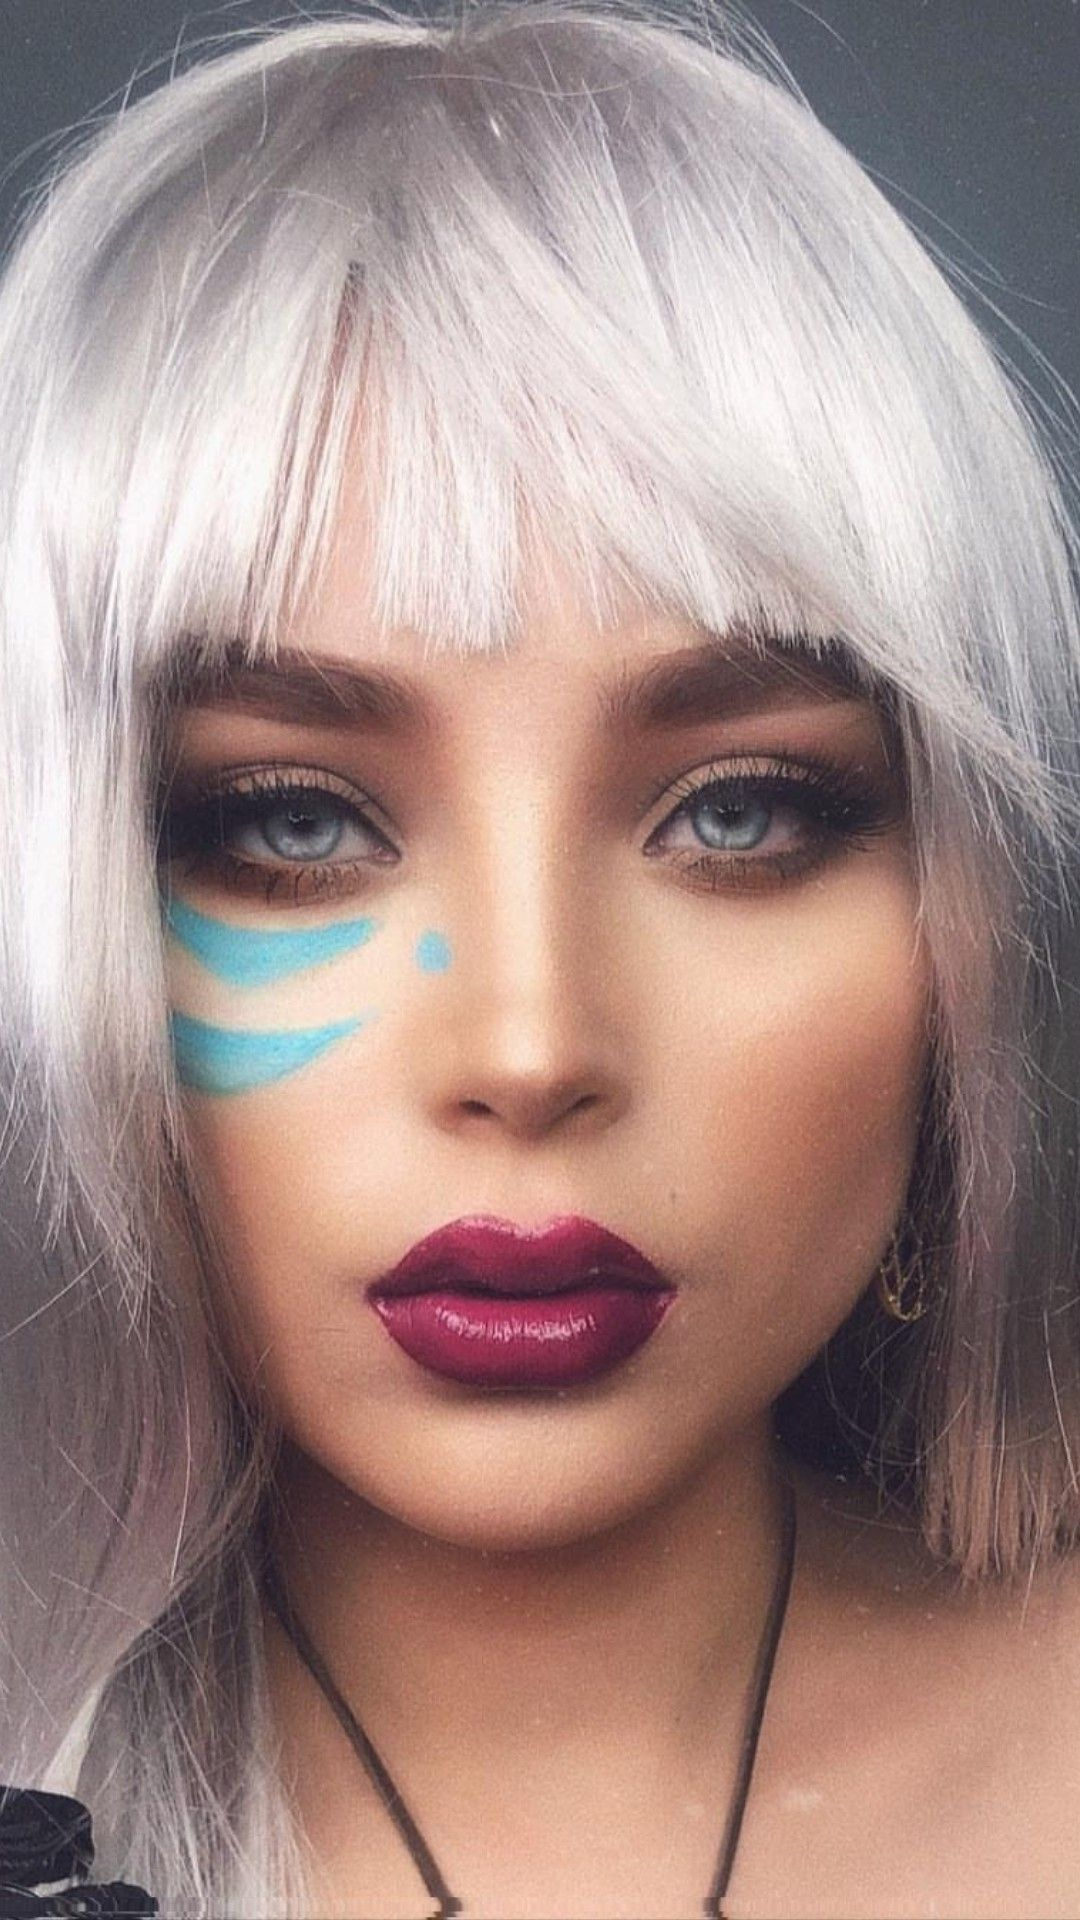 Pin by greywolf on Portraits Halloween makeup looks